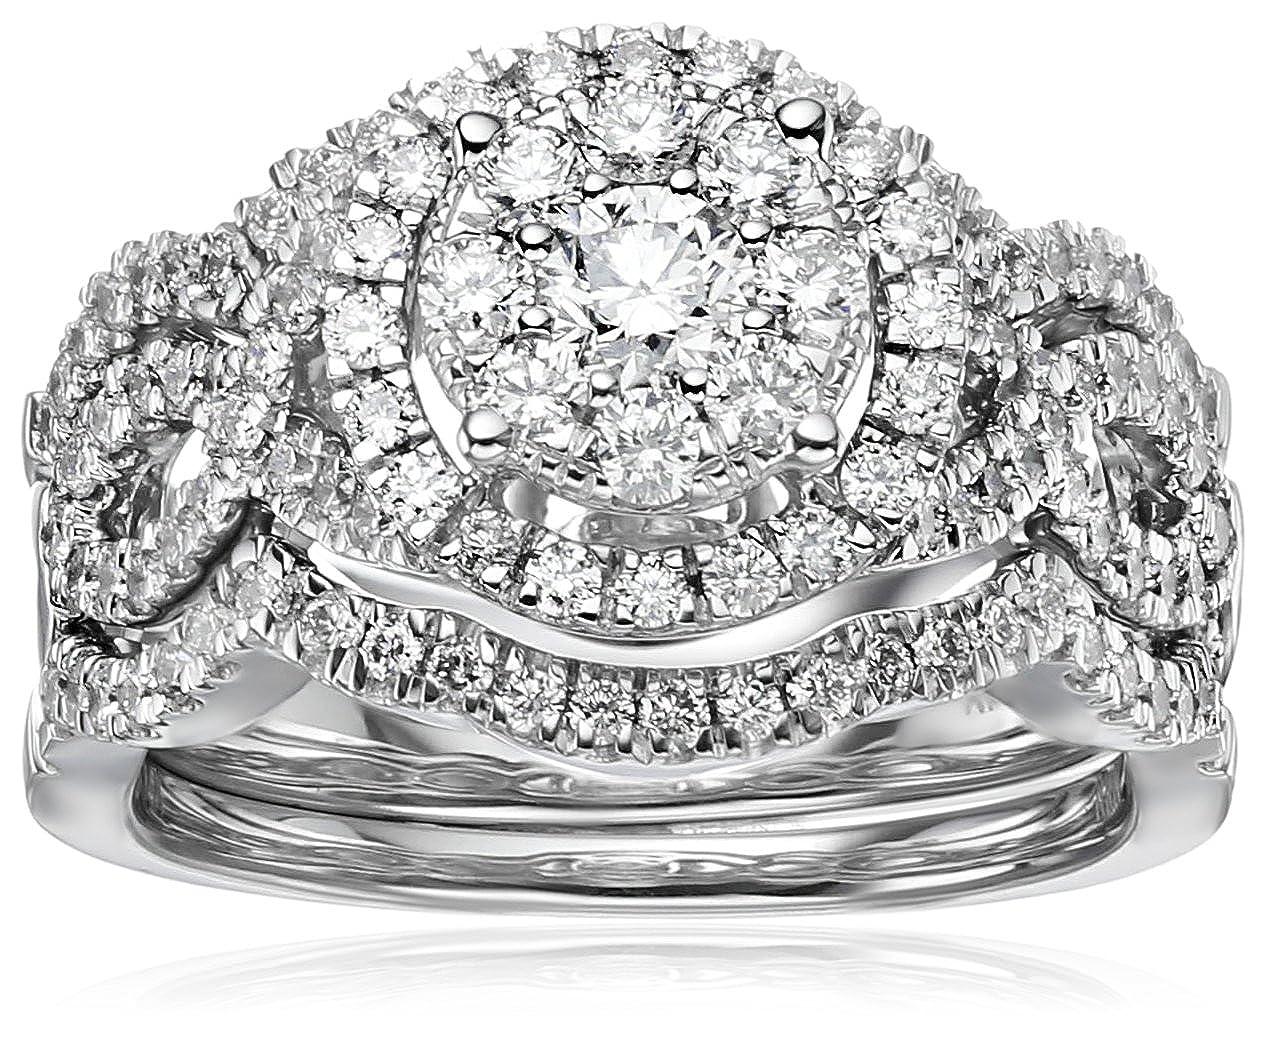 14k White Gold Diamond 3 Piece Wedding Ring Set 1 1 4 Cttw Hi Color I1 I2 Clarity Size 7